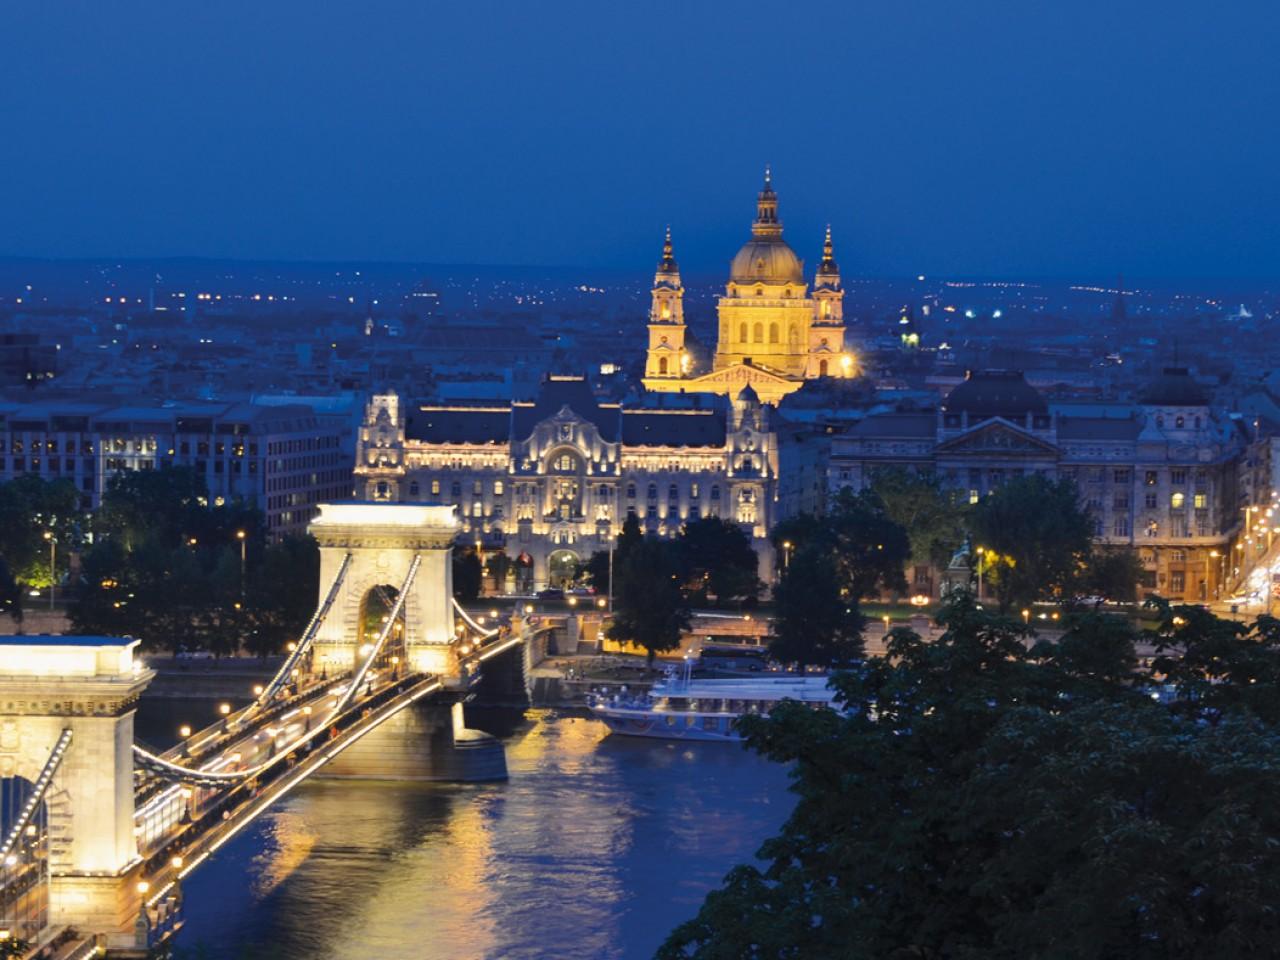 18th Budapest International Choir Festival & Competition